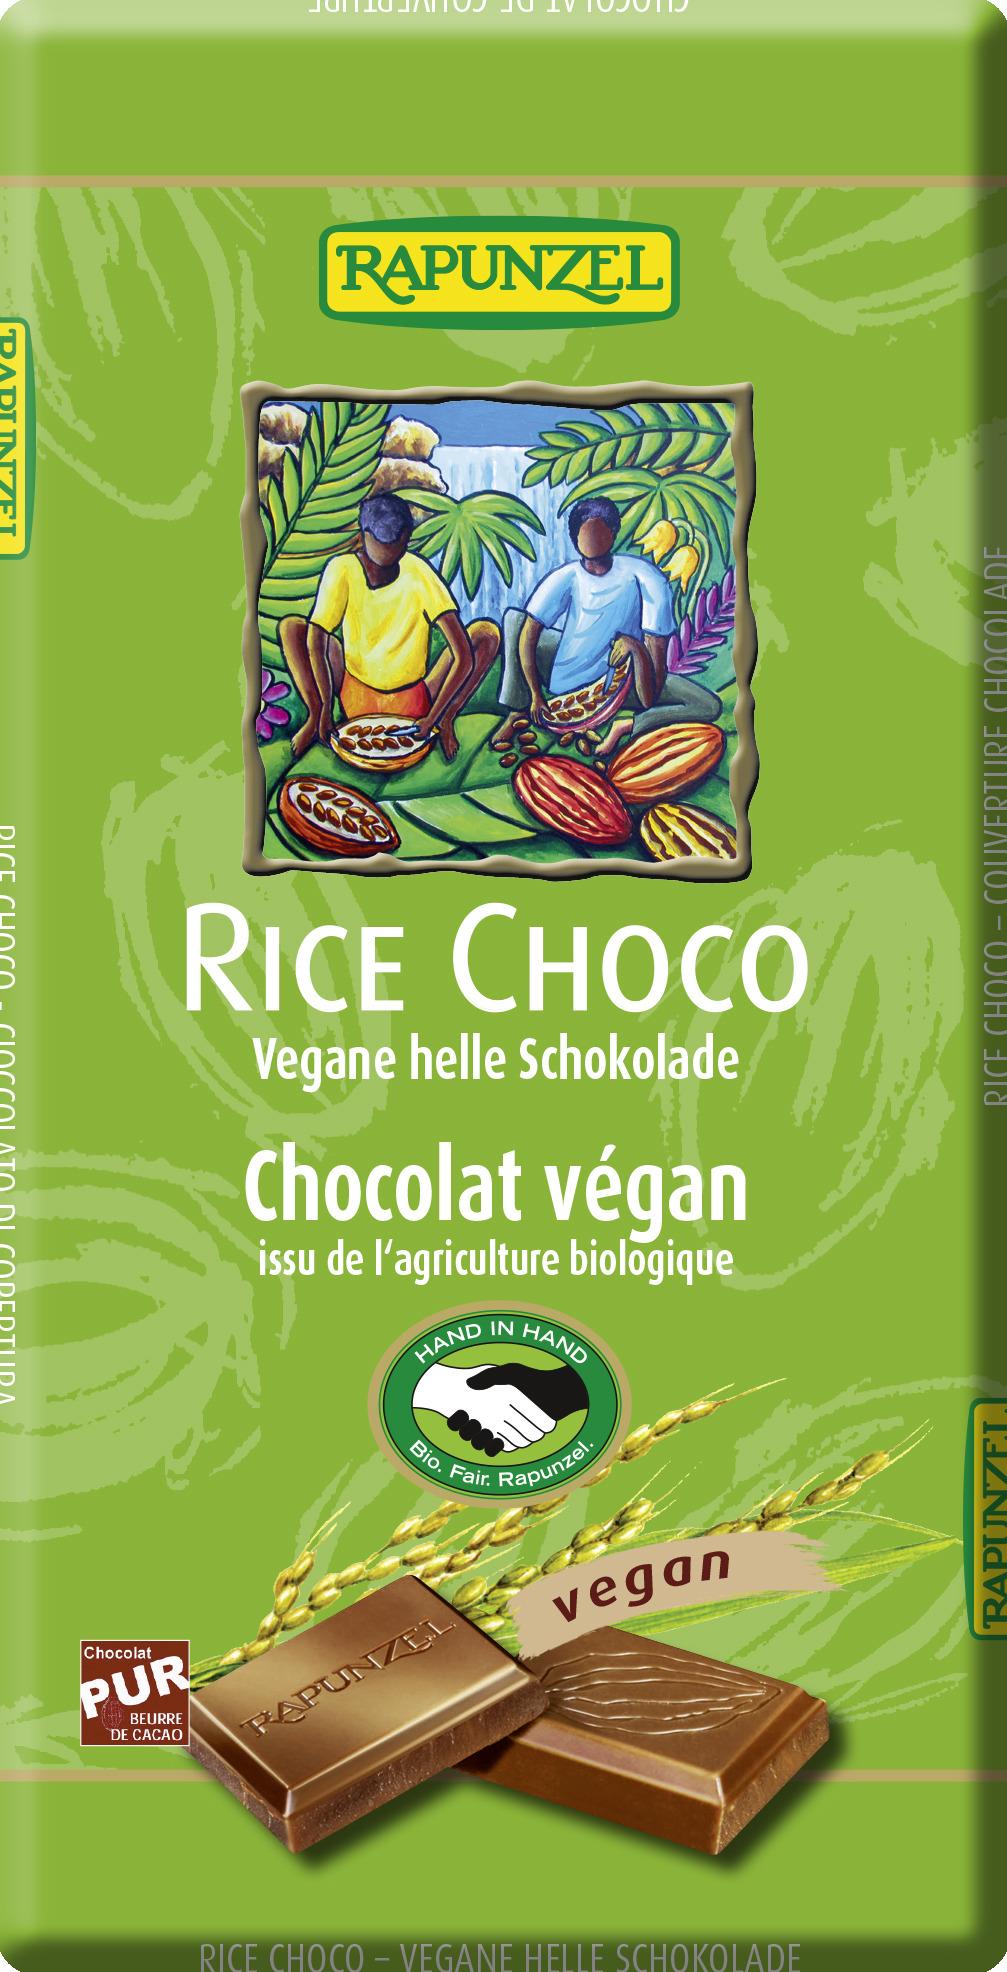 rice choco vegane helle schokolade vegan schokolade produkte rapunzel onlineshop. Black Bedroom Furniture Sets. Home Design Ideas